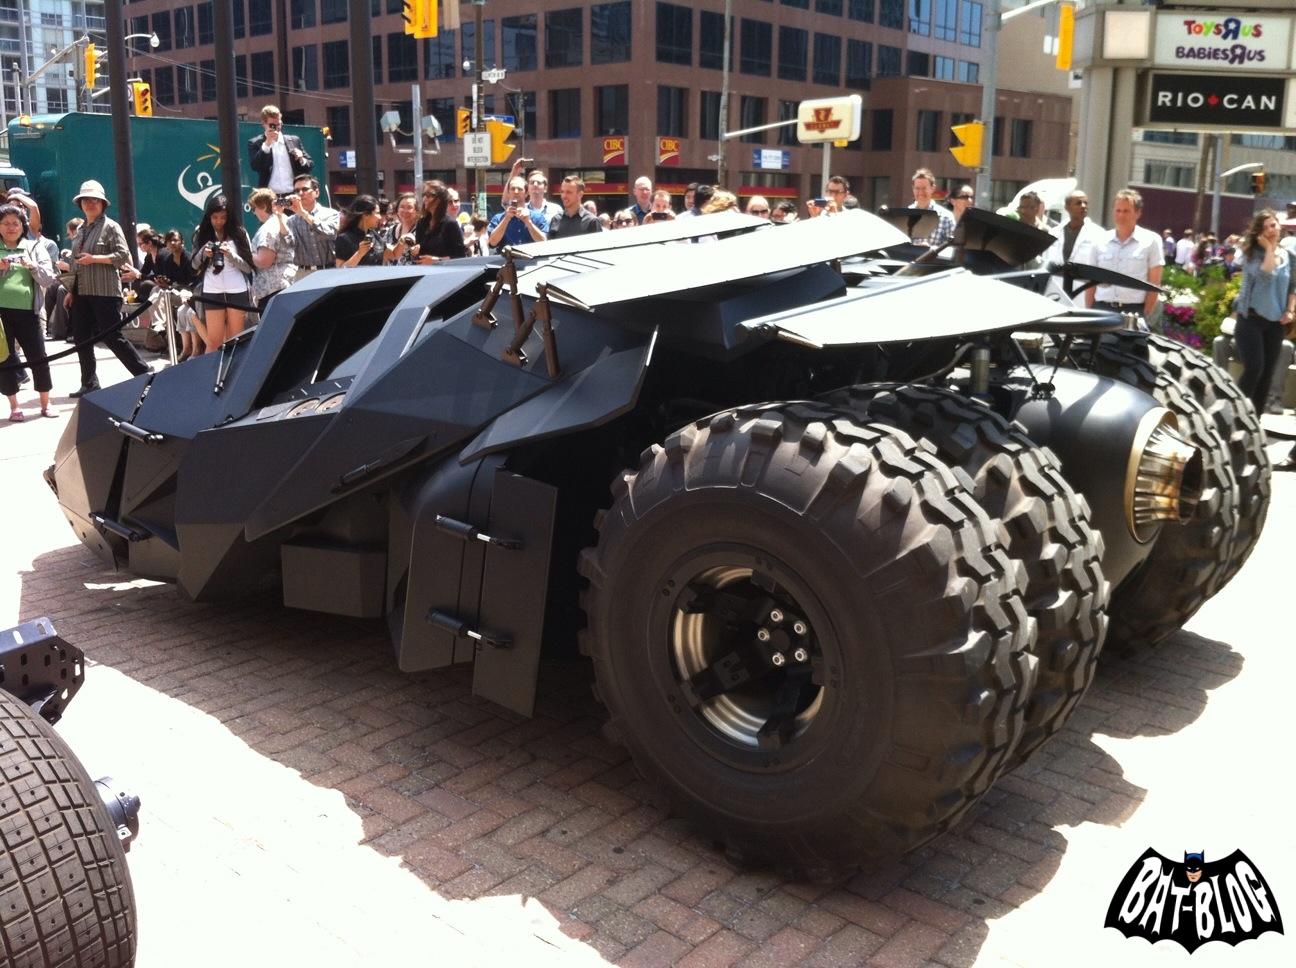 http://2.bp.blogspot.com/-jZHd25LGLpc/T9UMsHkpOsI/AAAAAAAAUD4/ItiRmjUNUcc/s1600/tumbler-tour-batmobile-canada-4.jpg